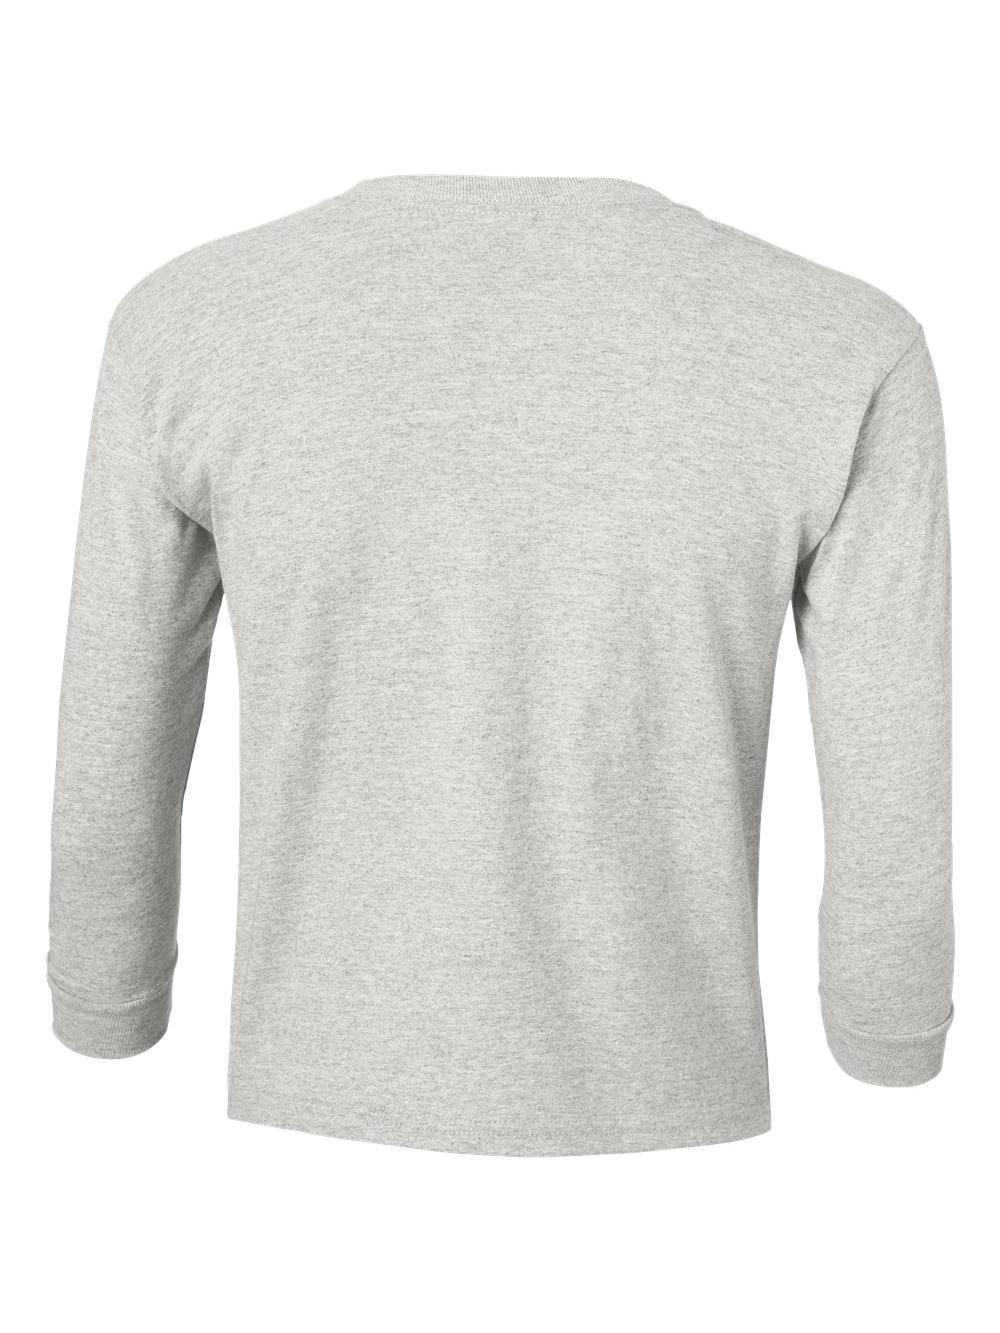 Gildan-Ultra-Cotton-Youth-Long-Sleeve-T-Shirt-2400B thumbnail 4